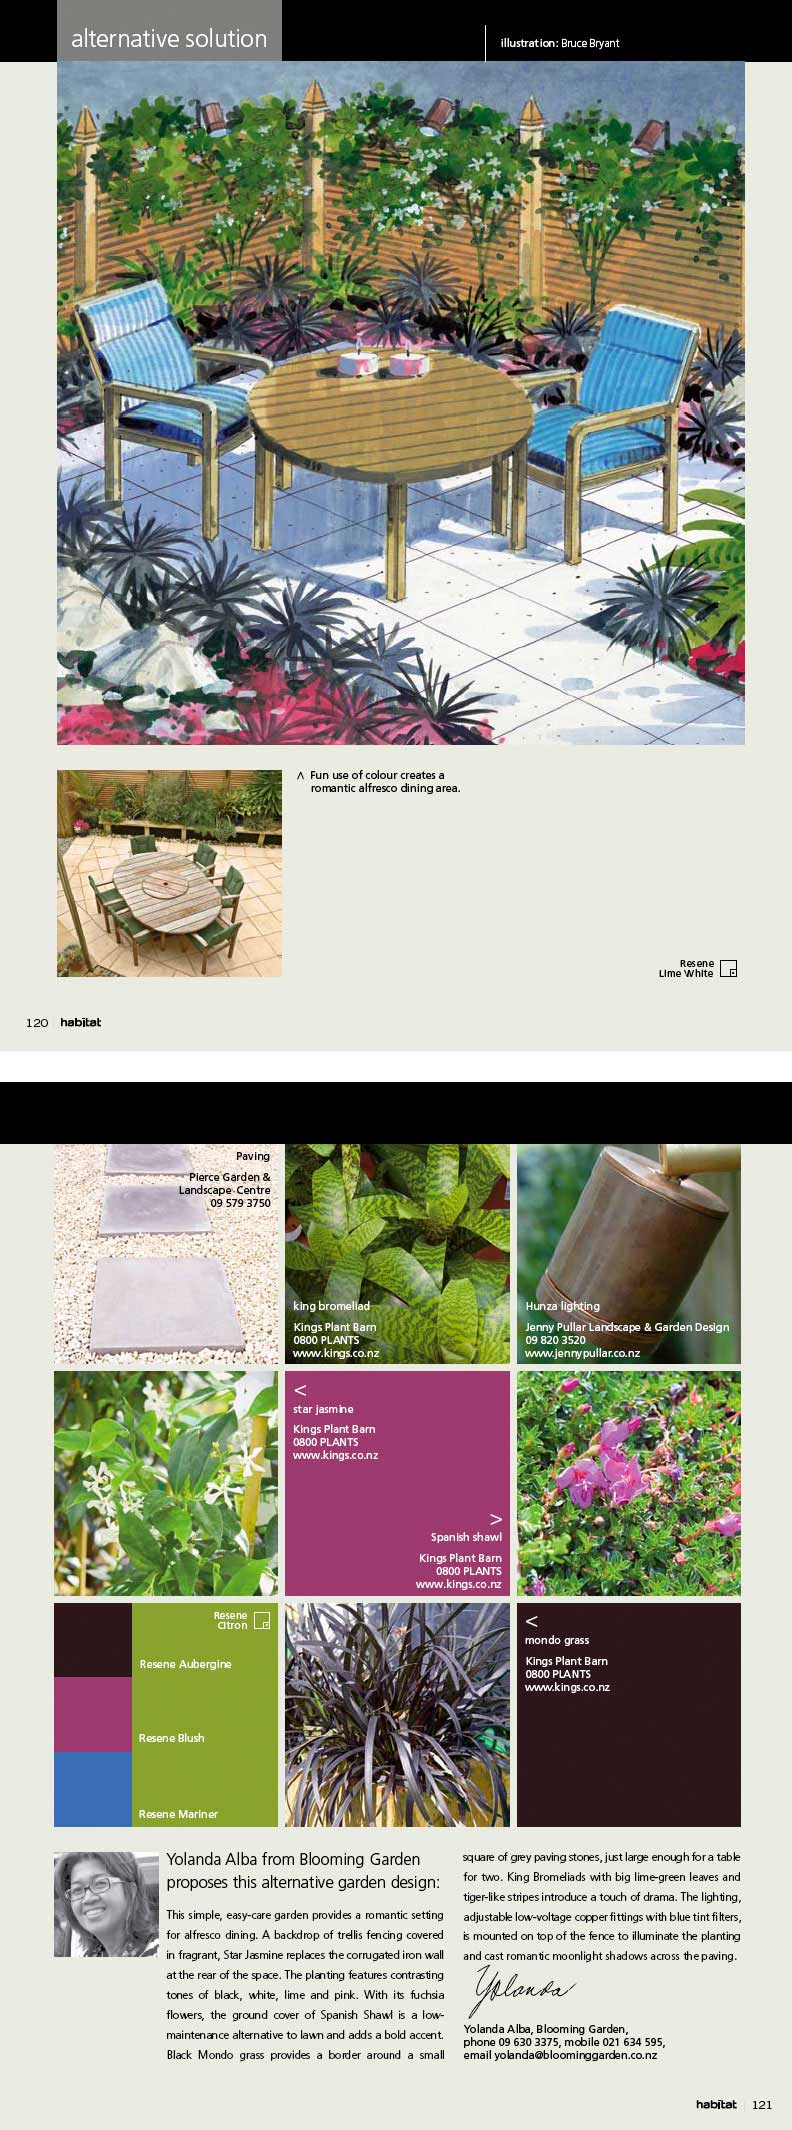 Waikanae Beach home and garden